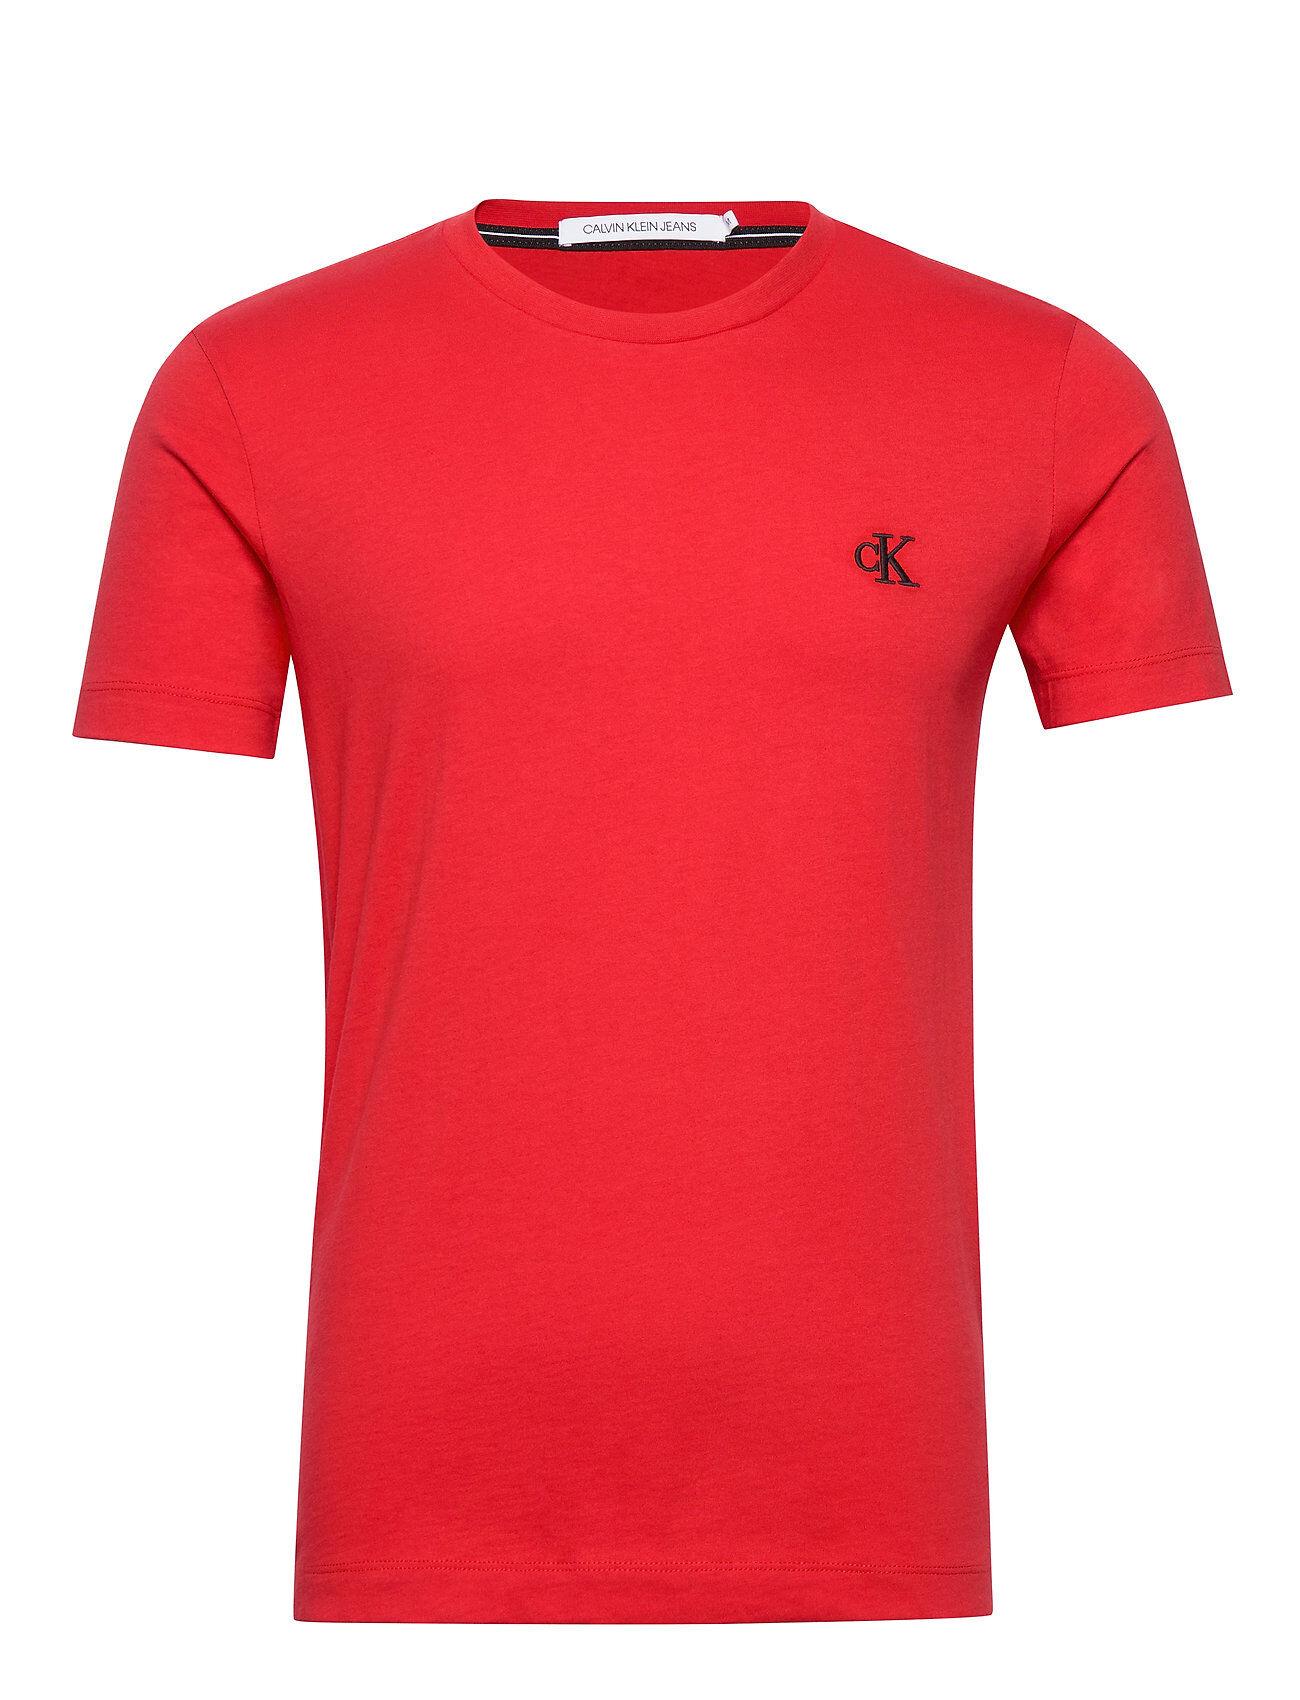 Image of Calvin Ck Essential Slim Tee T-shirts Short-sleeved Punainen Calvin Klein Jeans